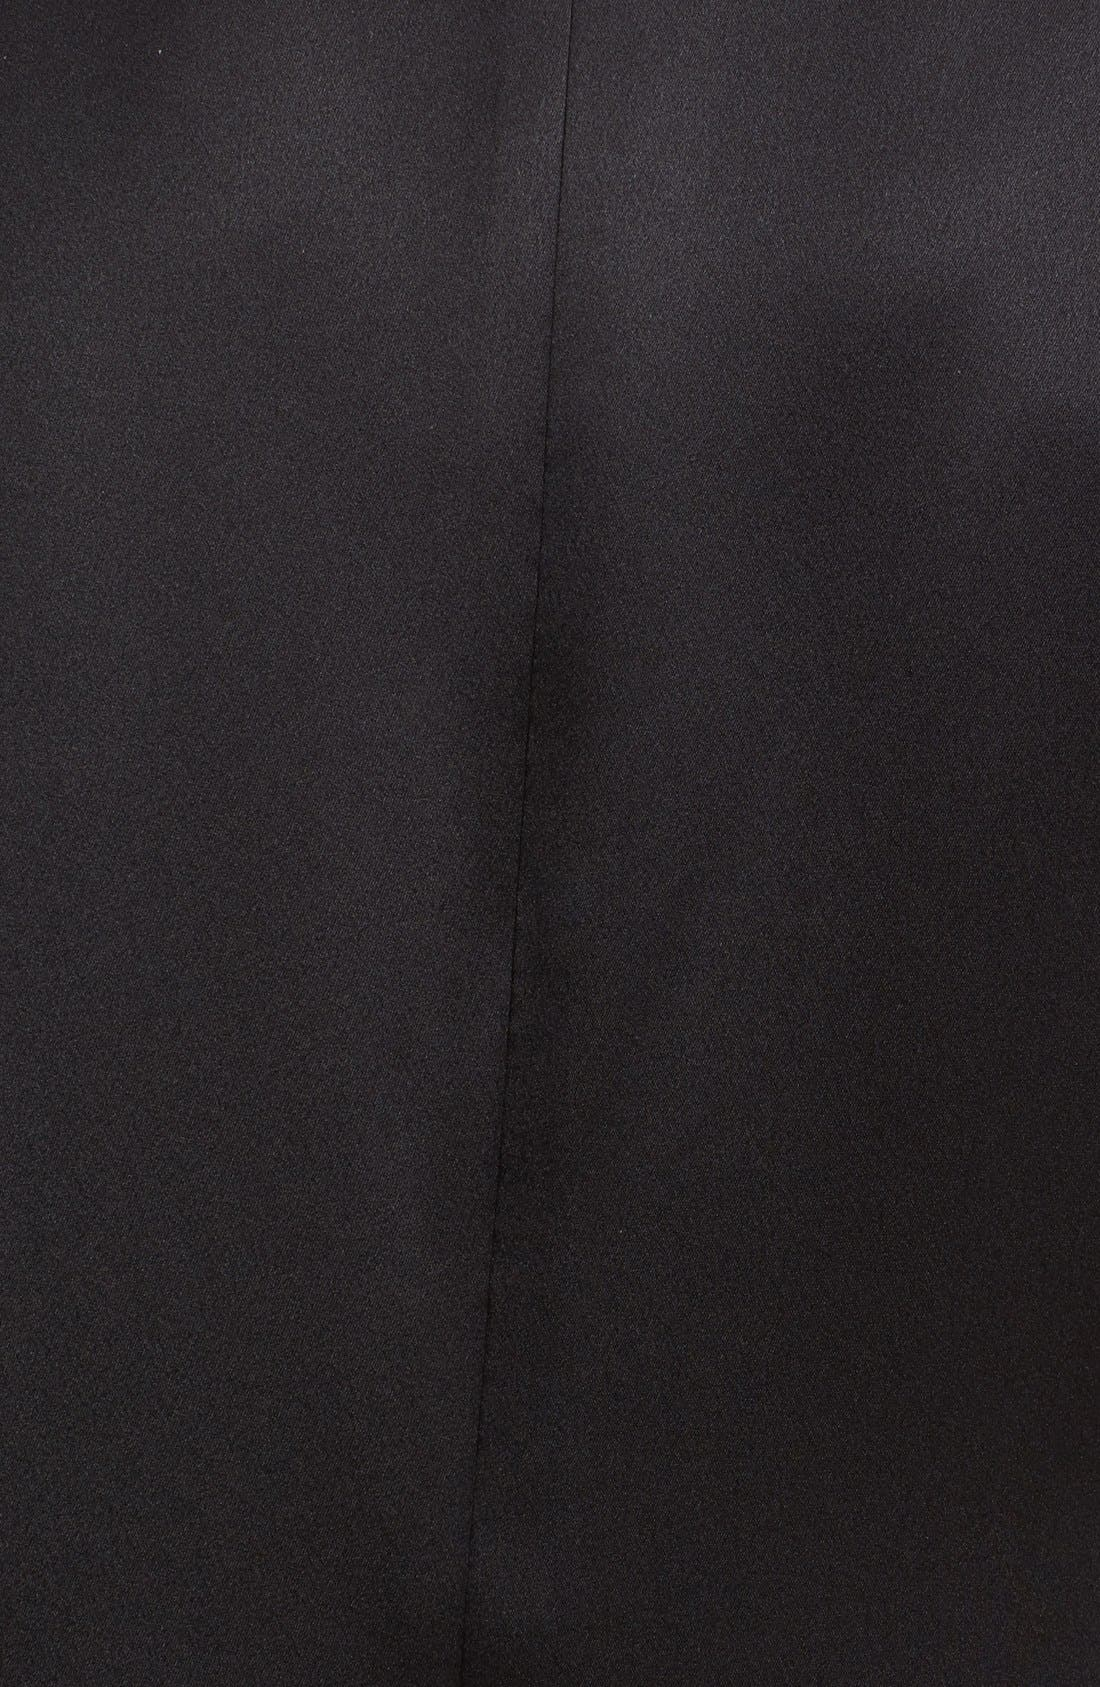 Short Sleeve Crepe Back Top,                             Alternate thumbnail 3, color,                             Black